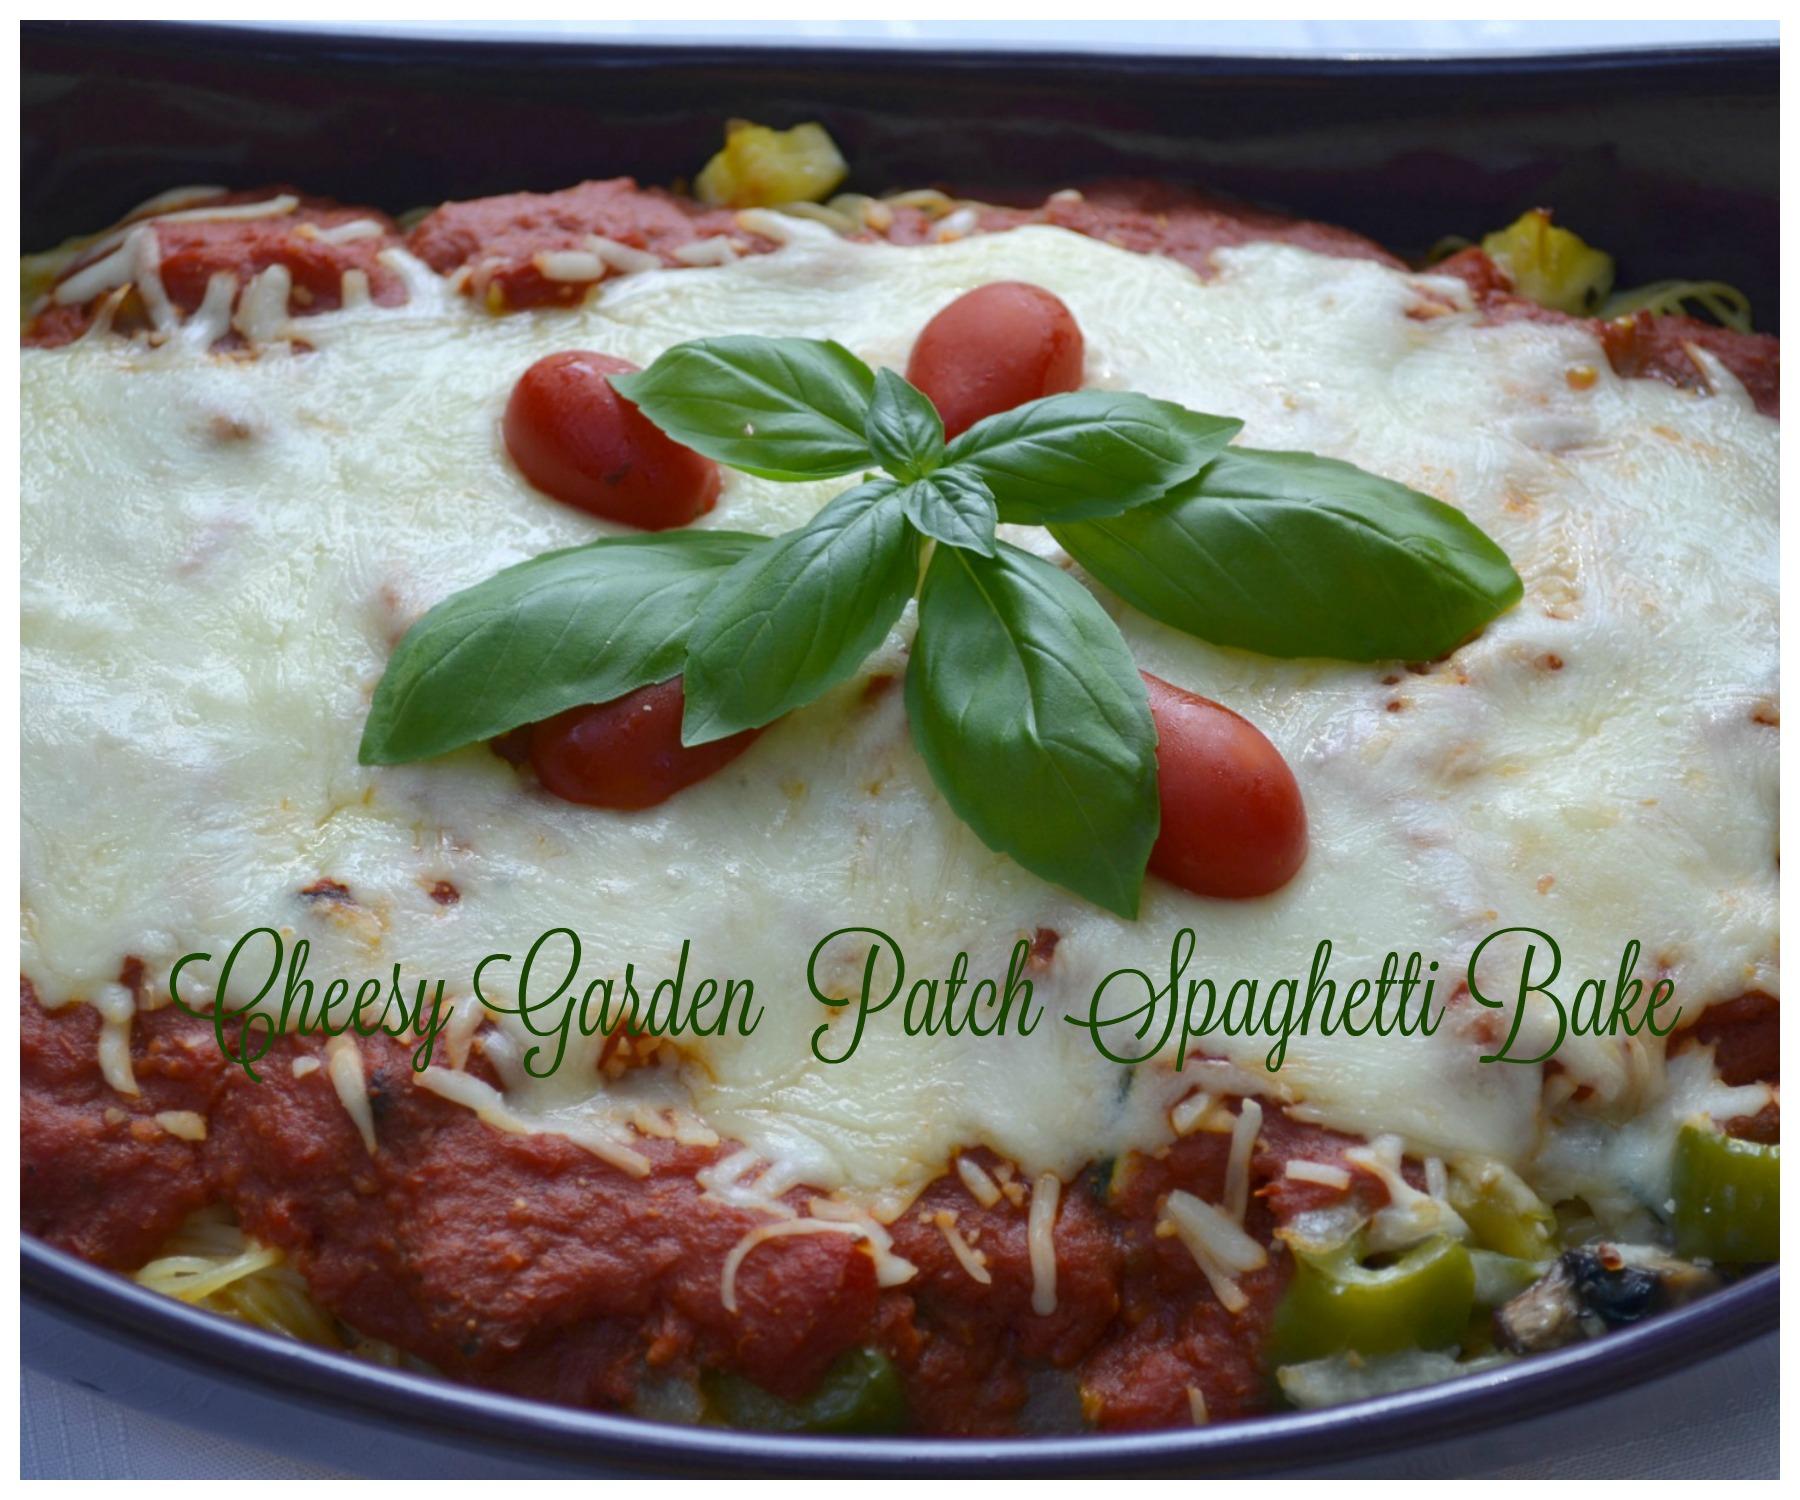 spaghetti, veggies, pasta, cheese, italian, cheesy garden patch spaghetti bake